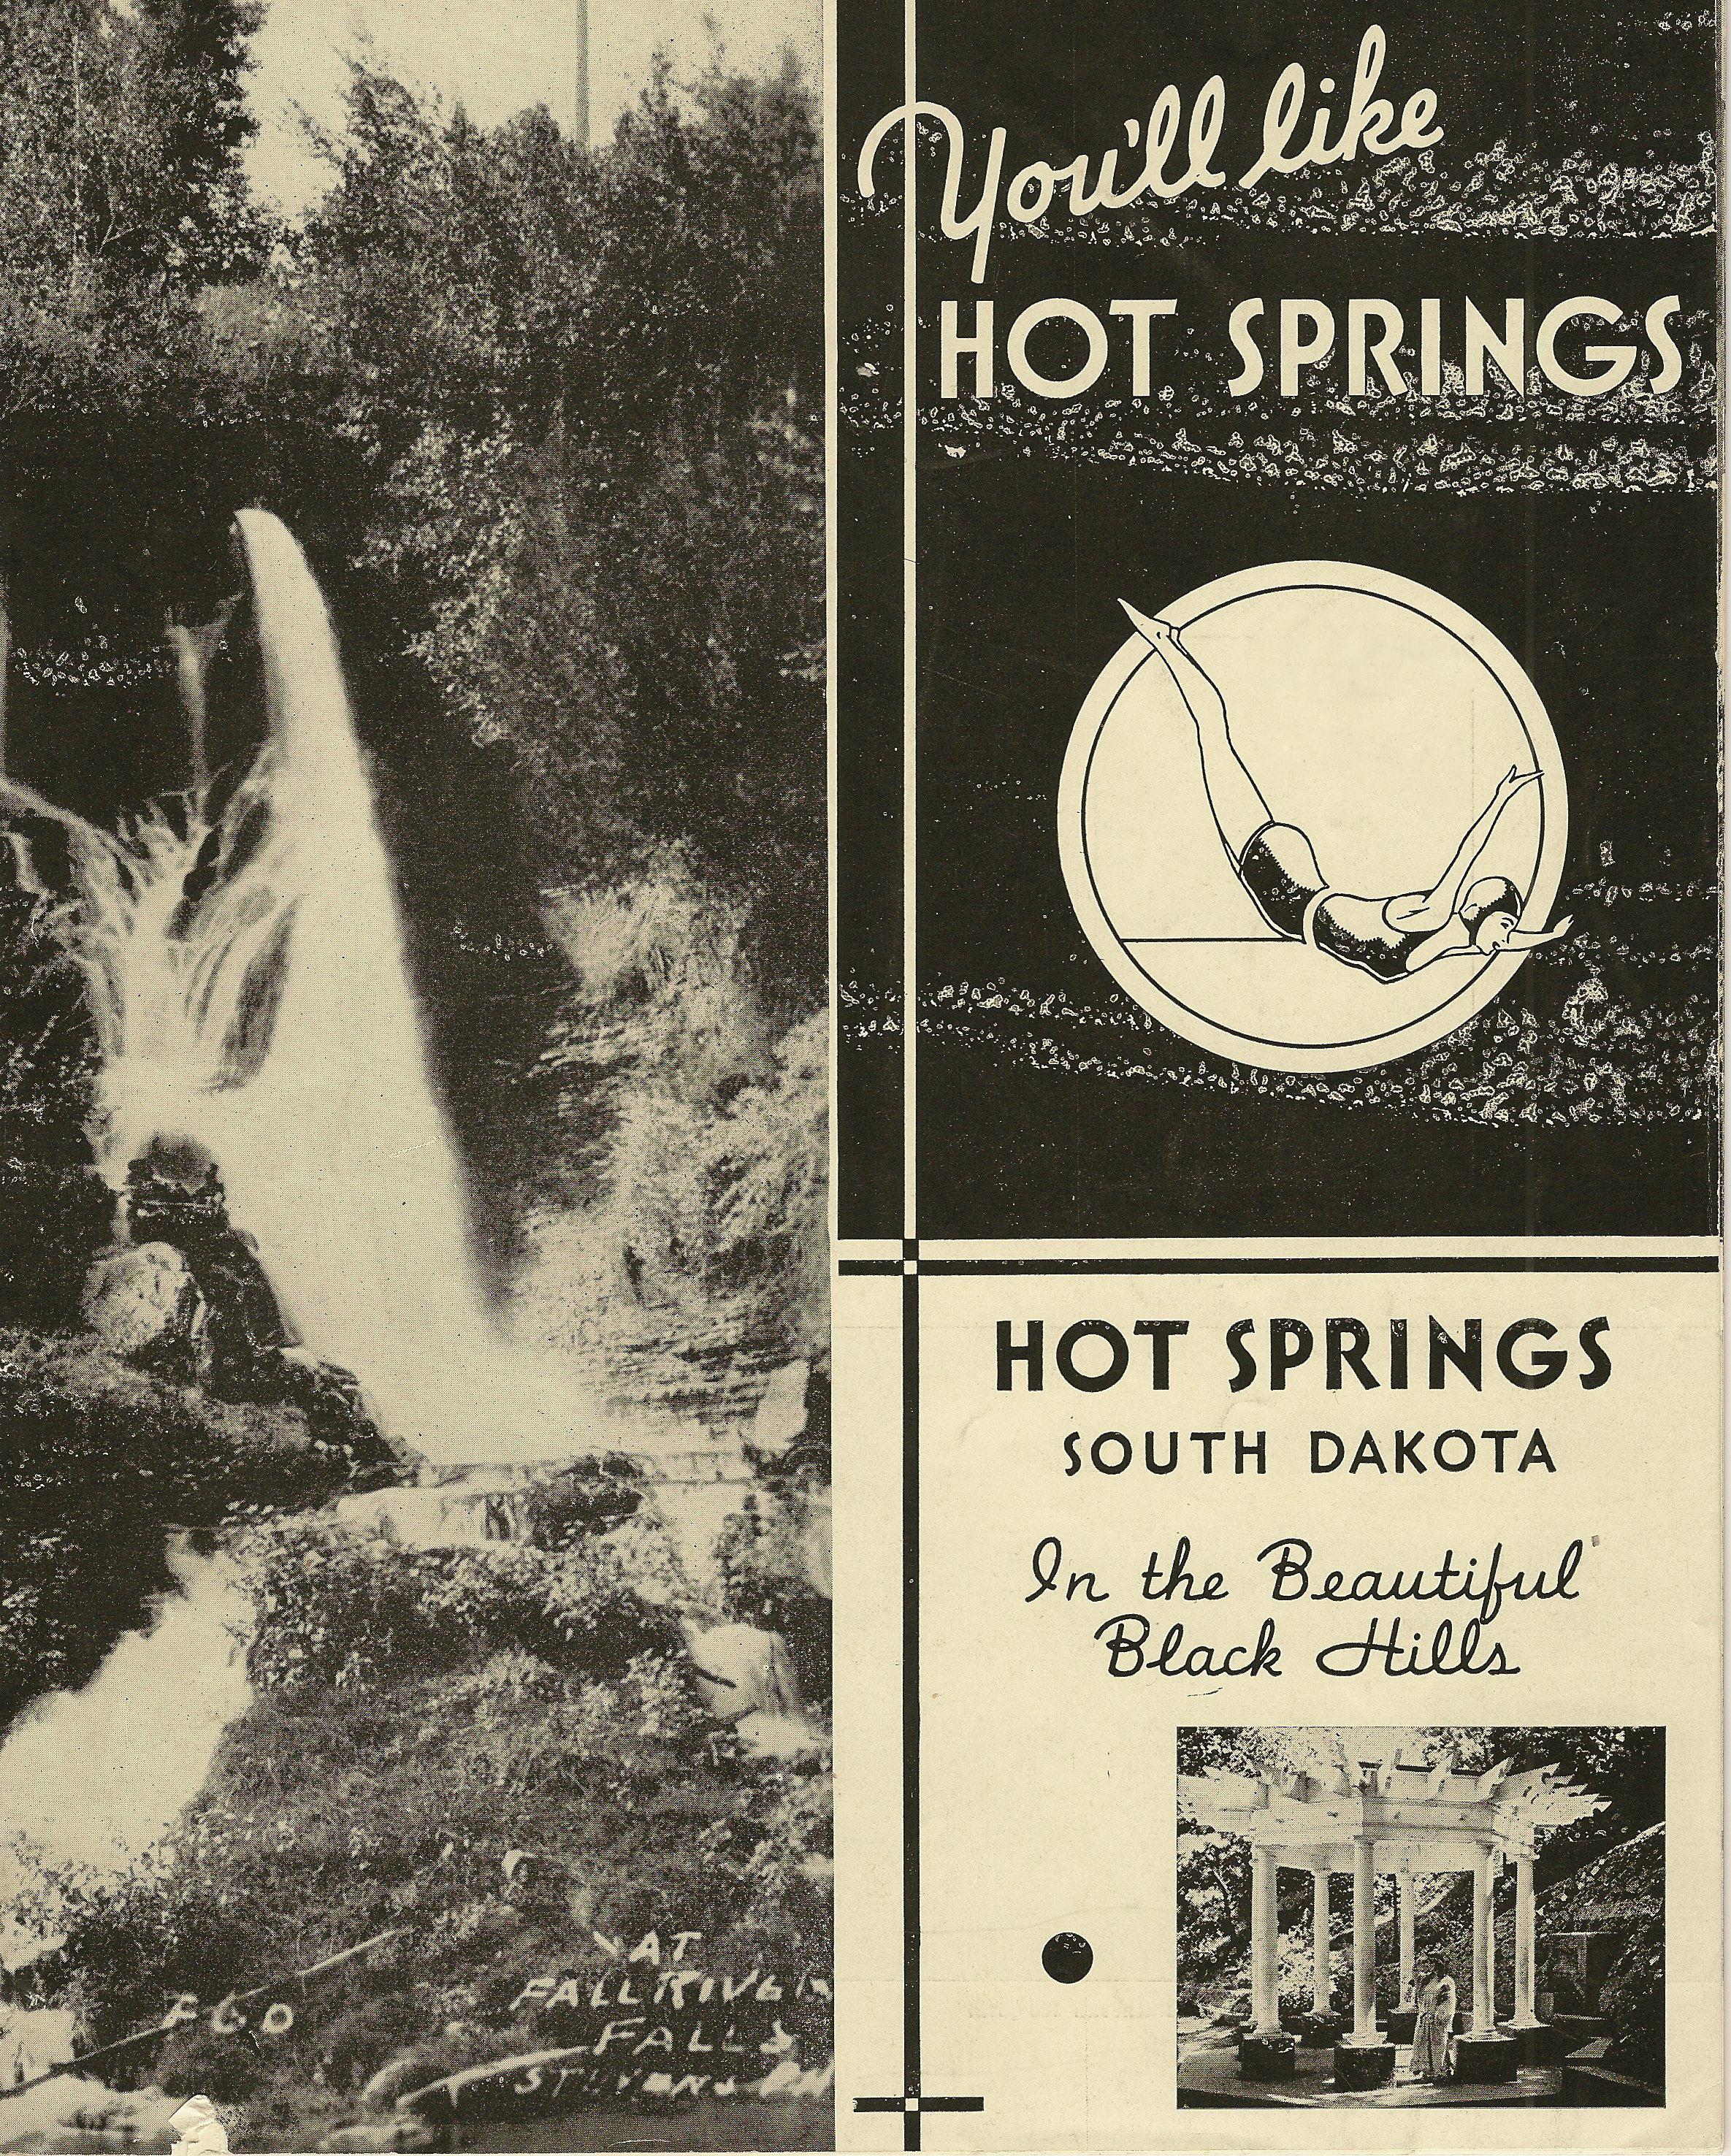 Image - HSbookletcirca1930s.JPG